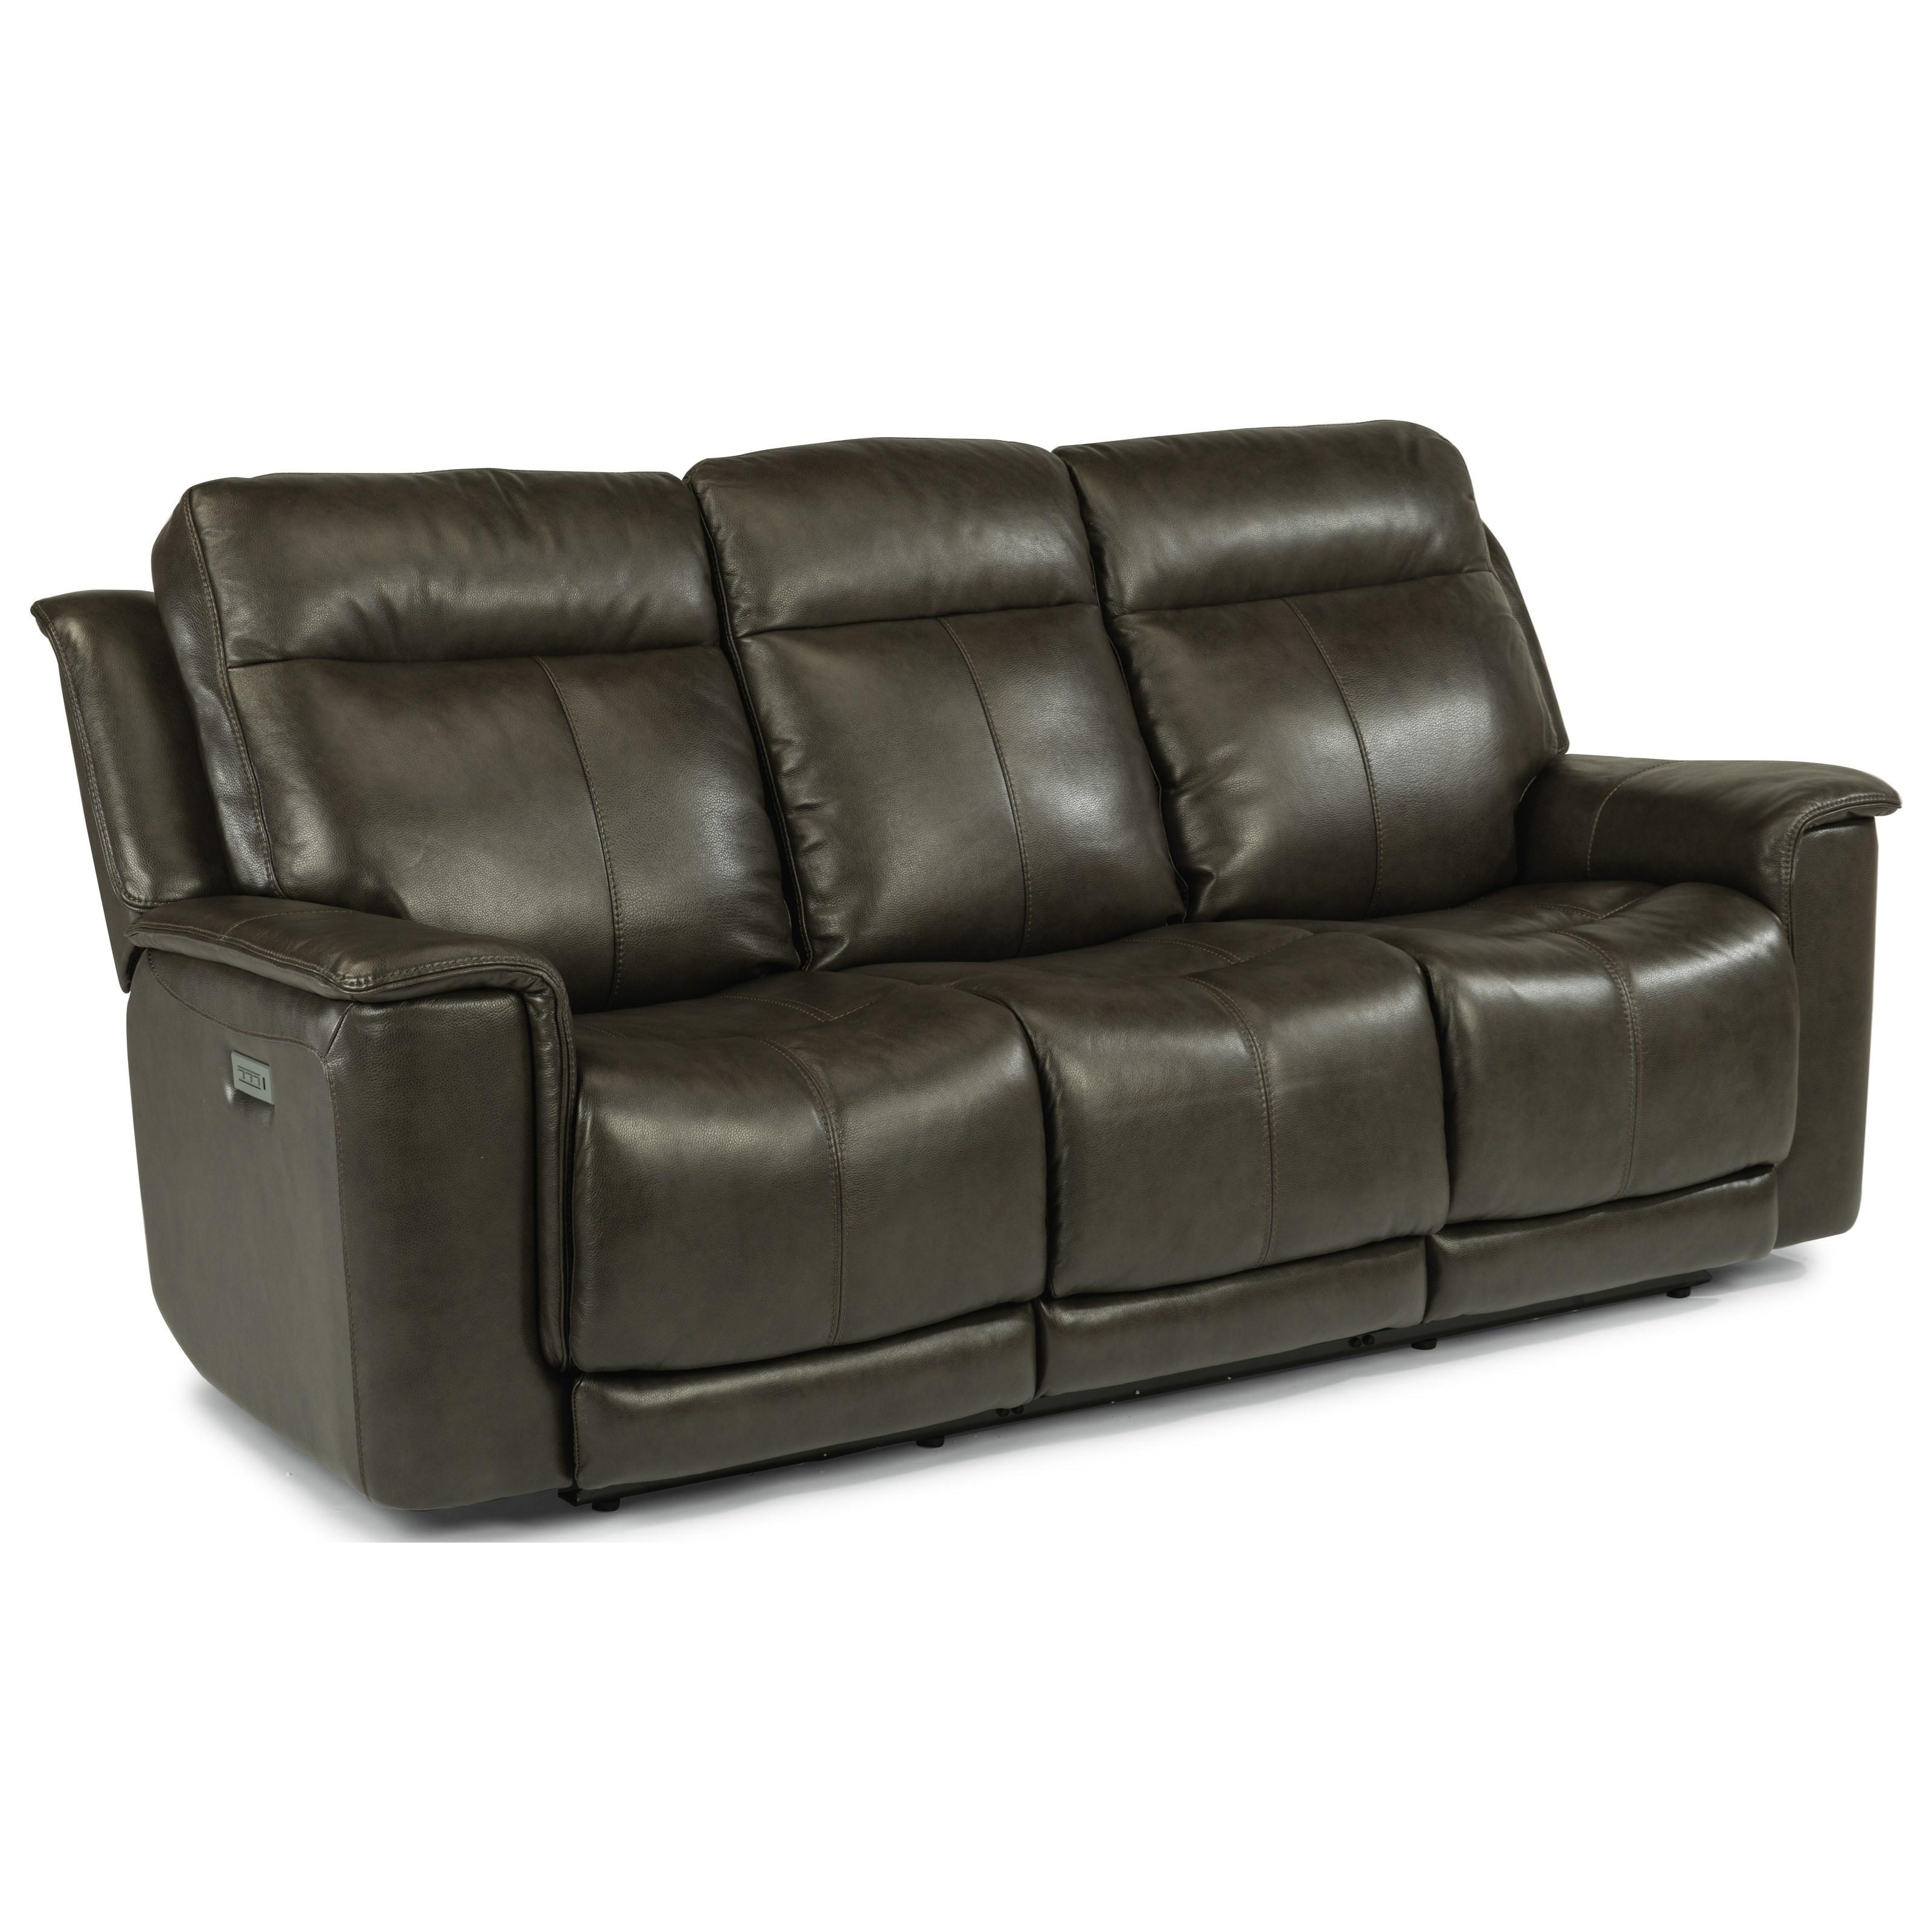 Latitudes - Miller Power Reclining Sofa by Flexsteel at Darvin Furniture